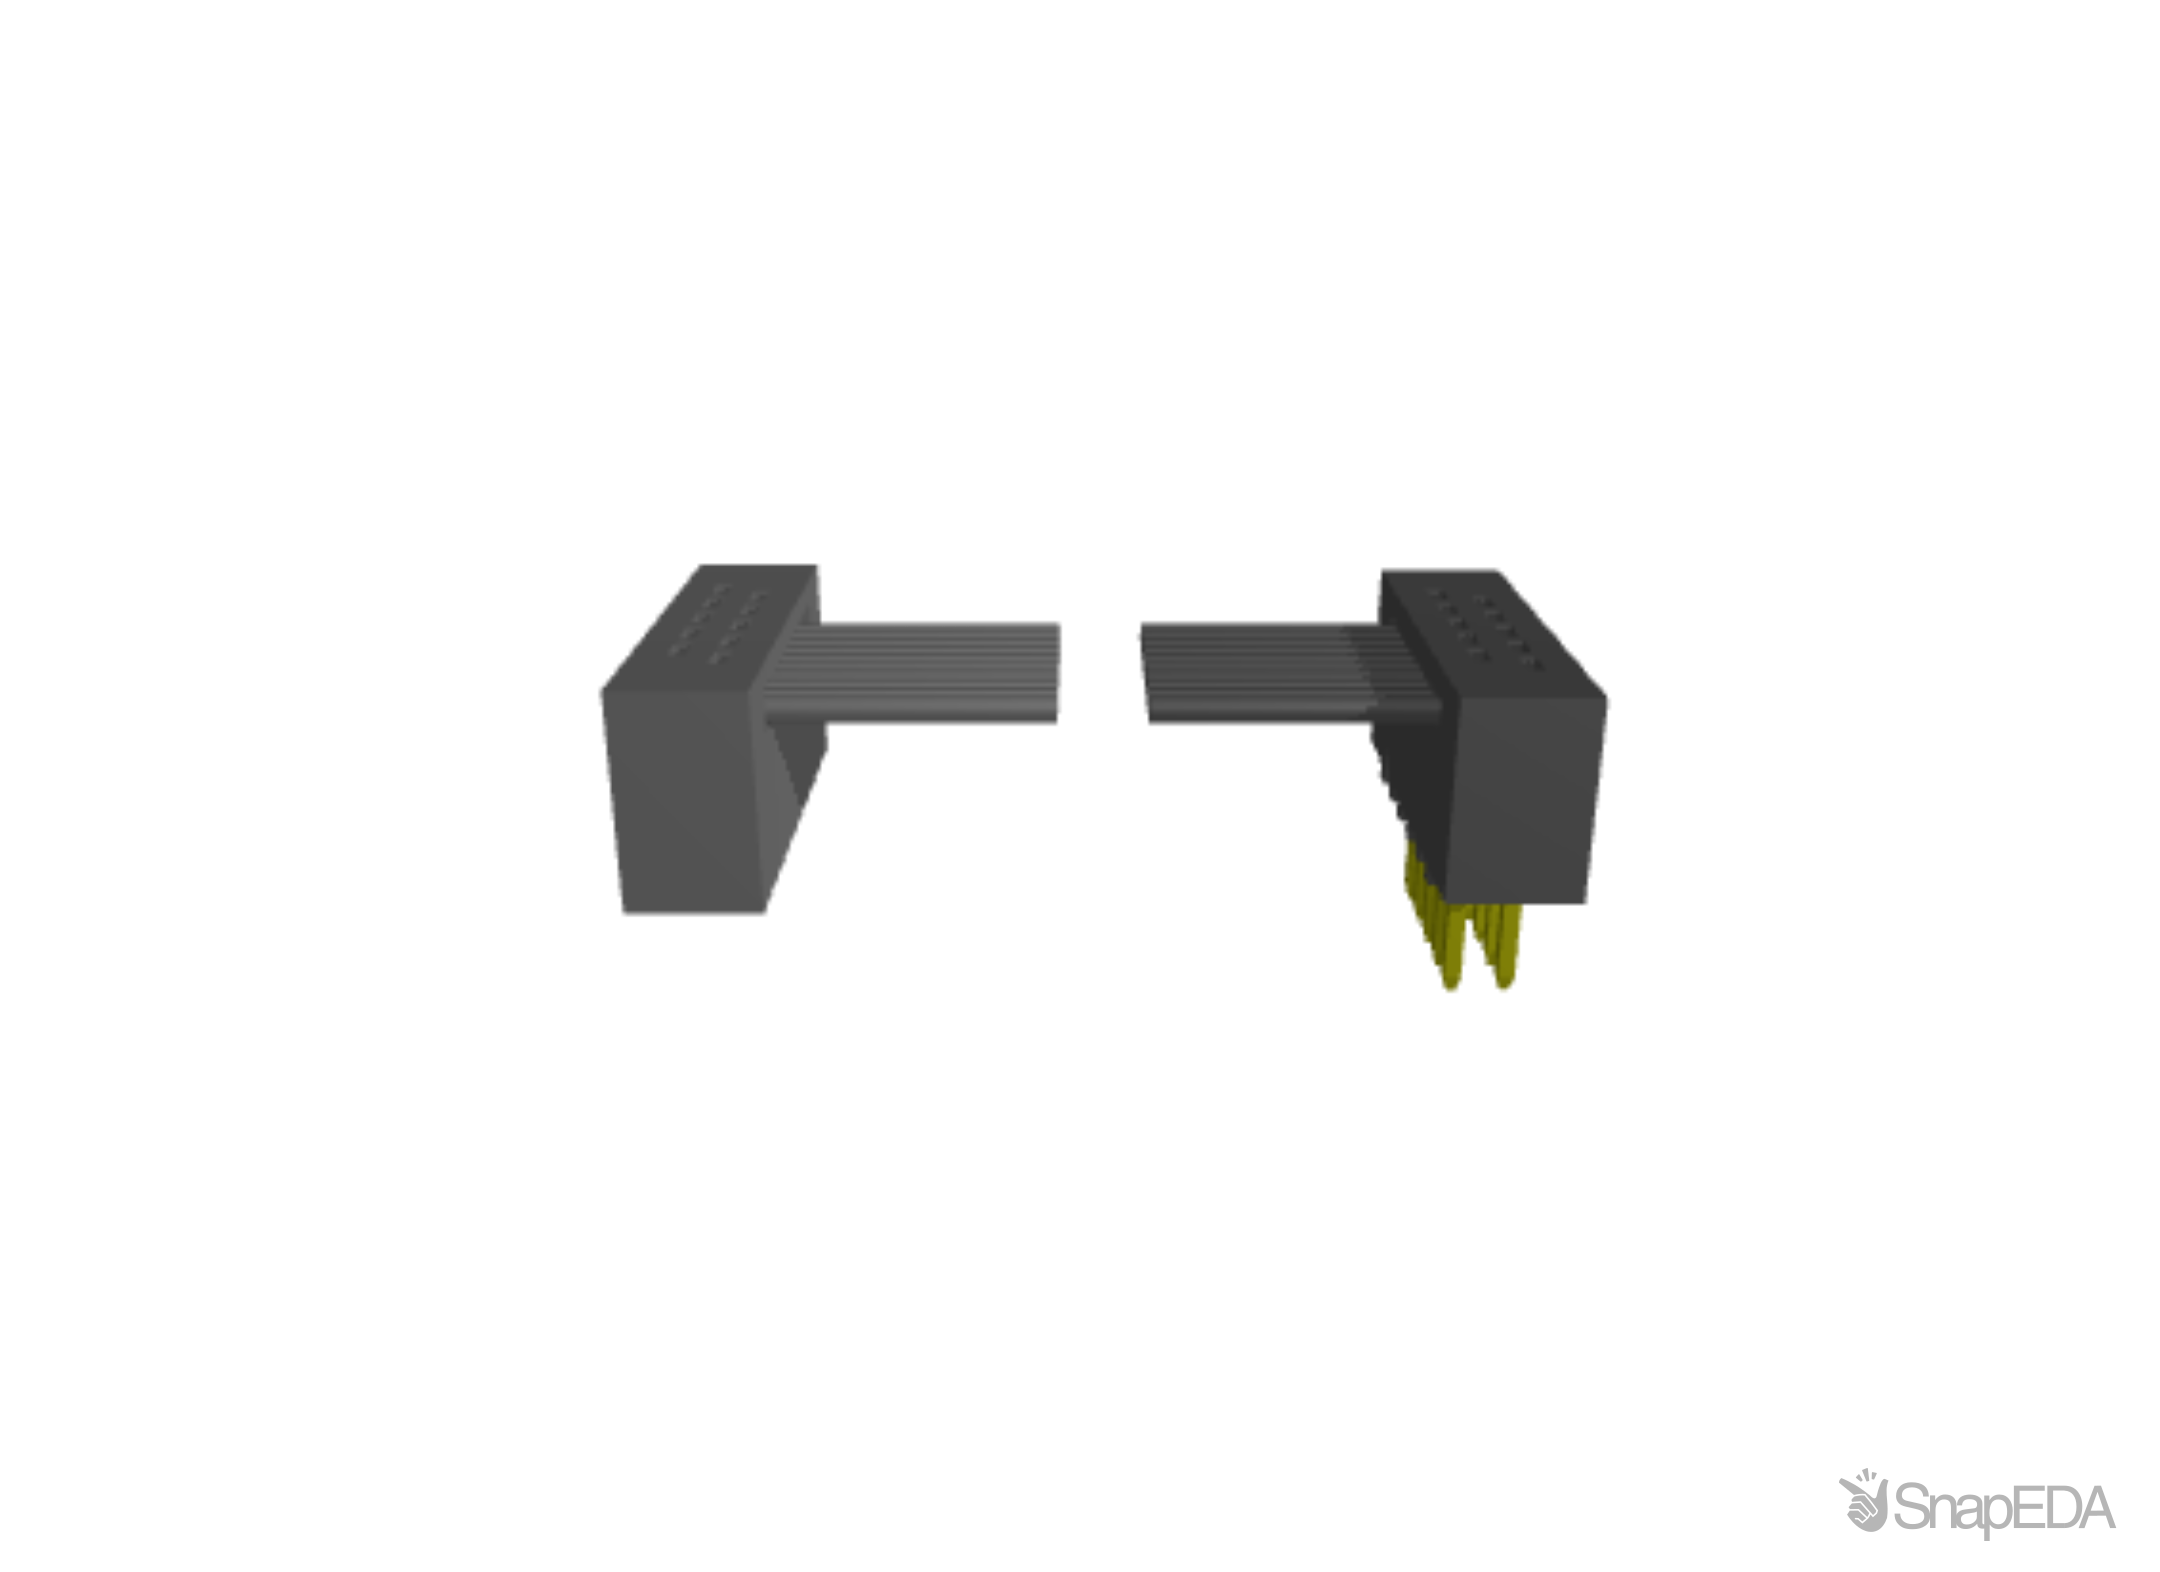 FFMD-05-T-02.00-01-L-N 3D Model